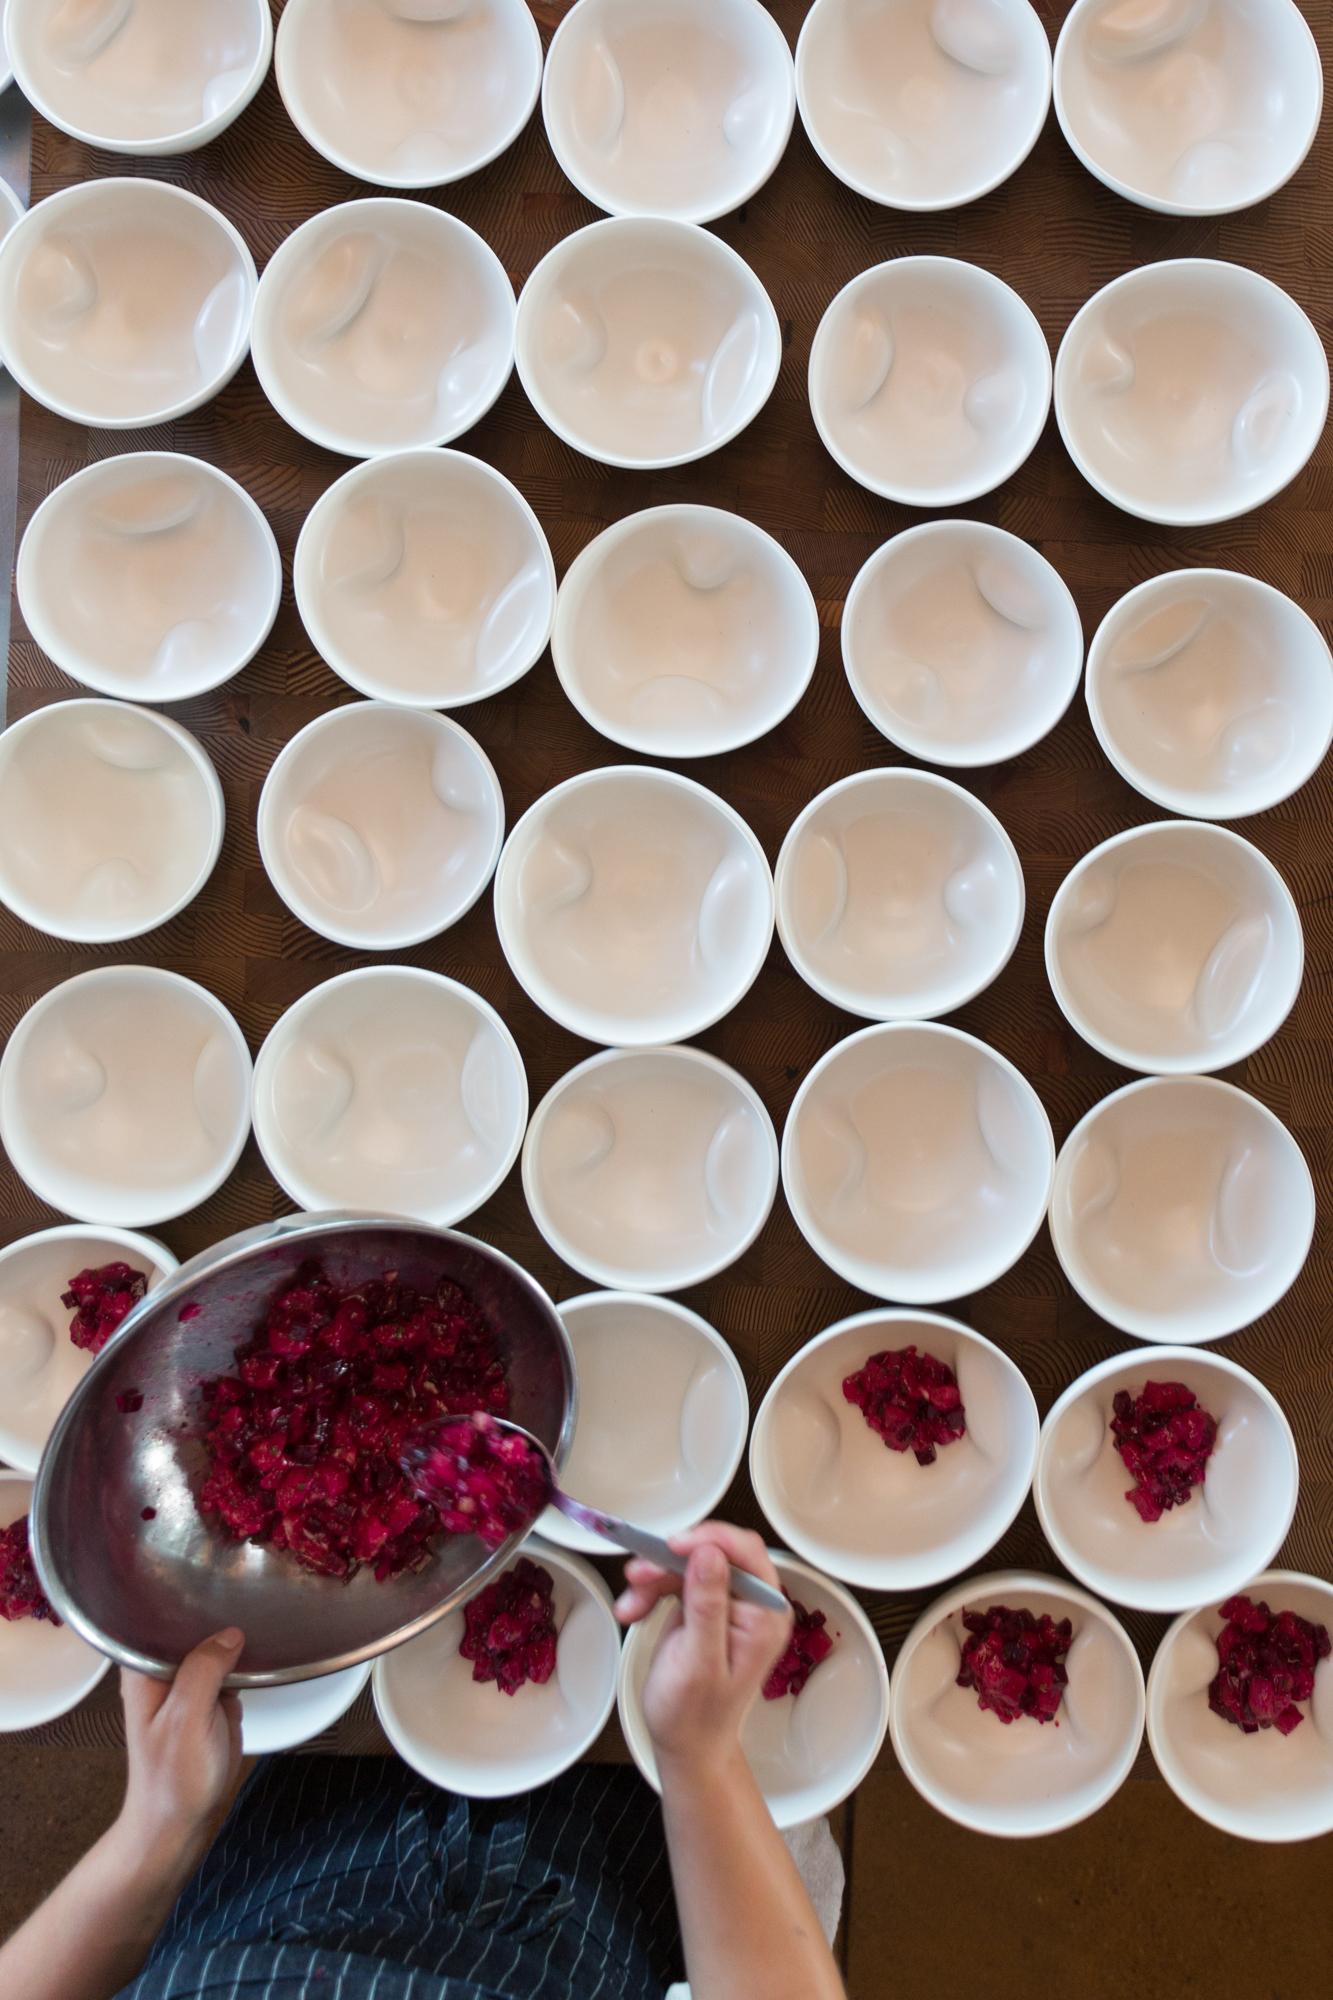 c stoll soter winery ipnc 2018 porcelain bowls beet salad.jpg